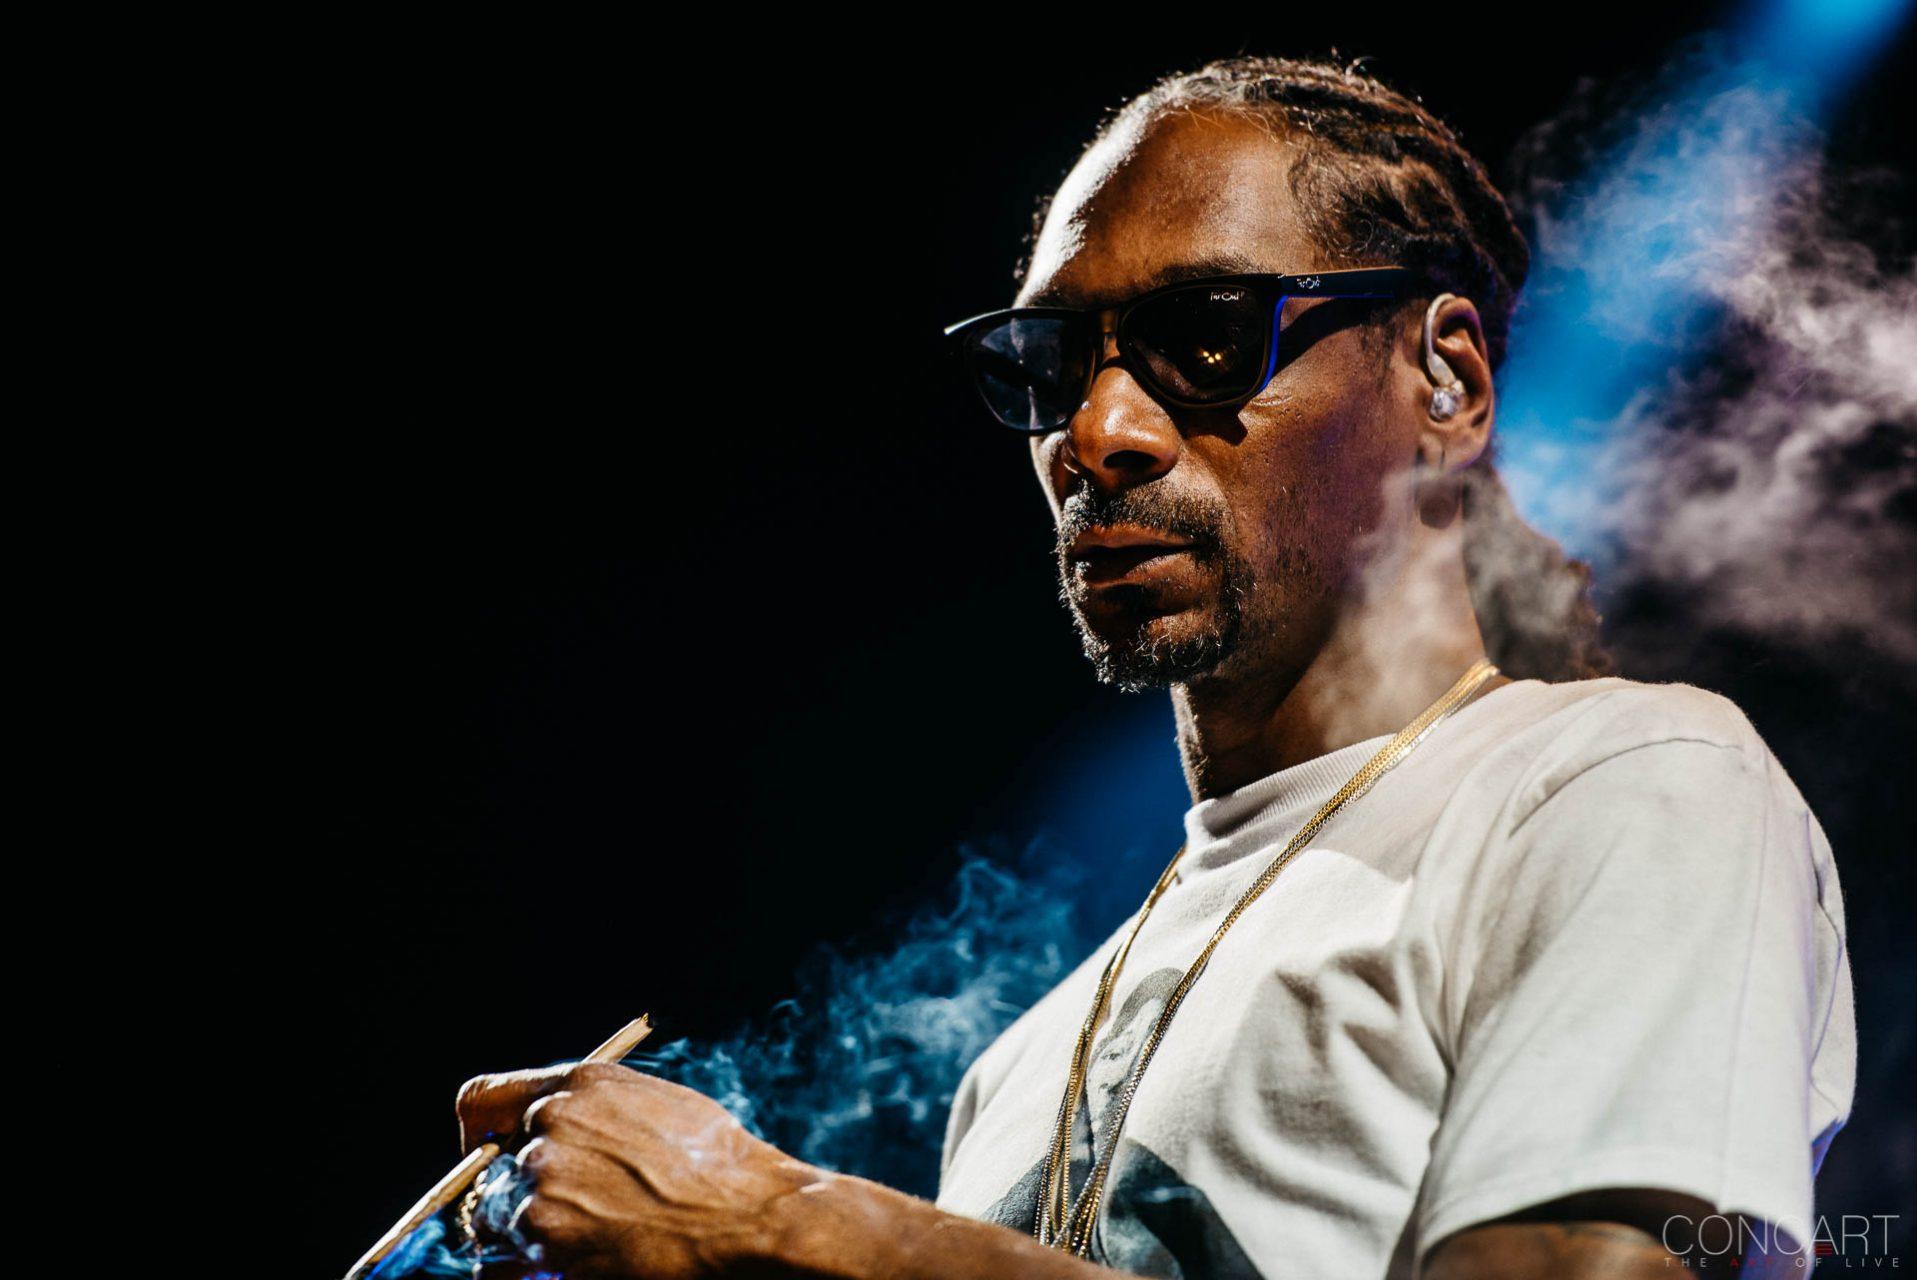 Snoop Dogg photo by Sean Molin